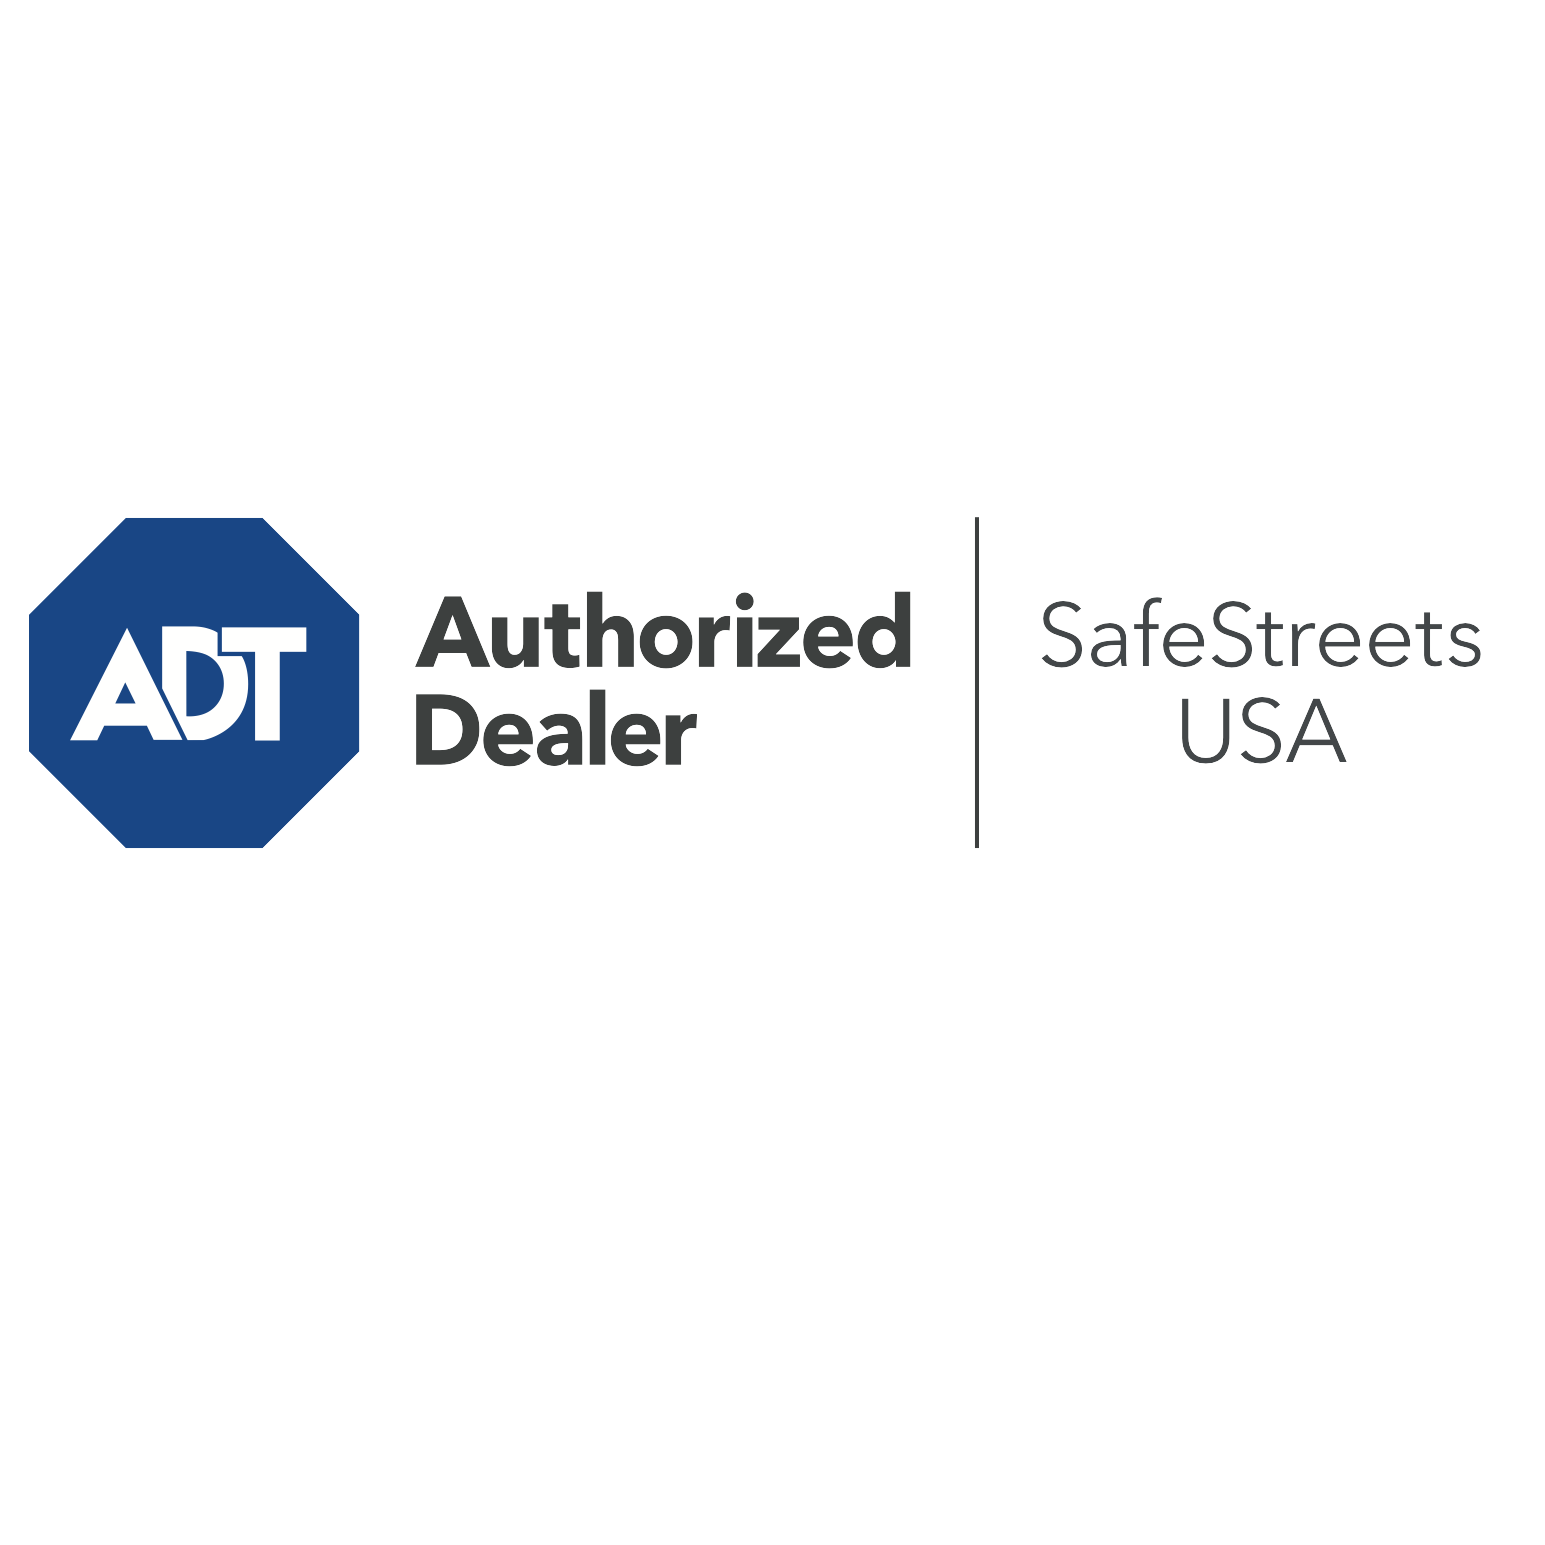 ADT Security Authorized Dealer